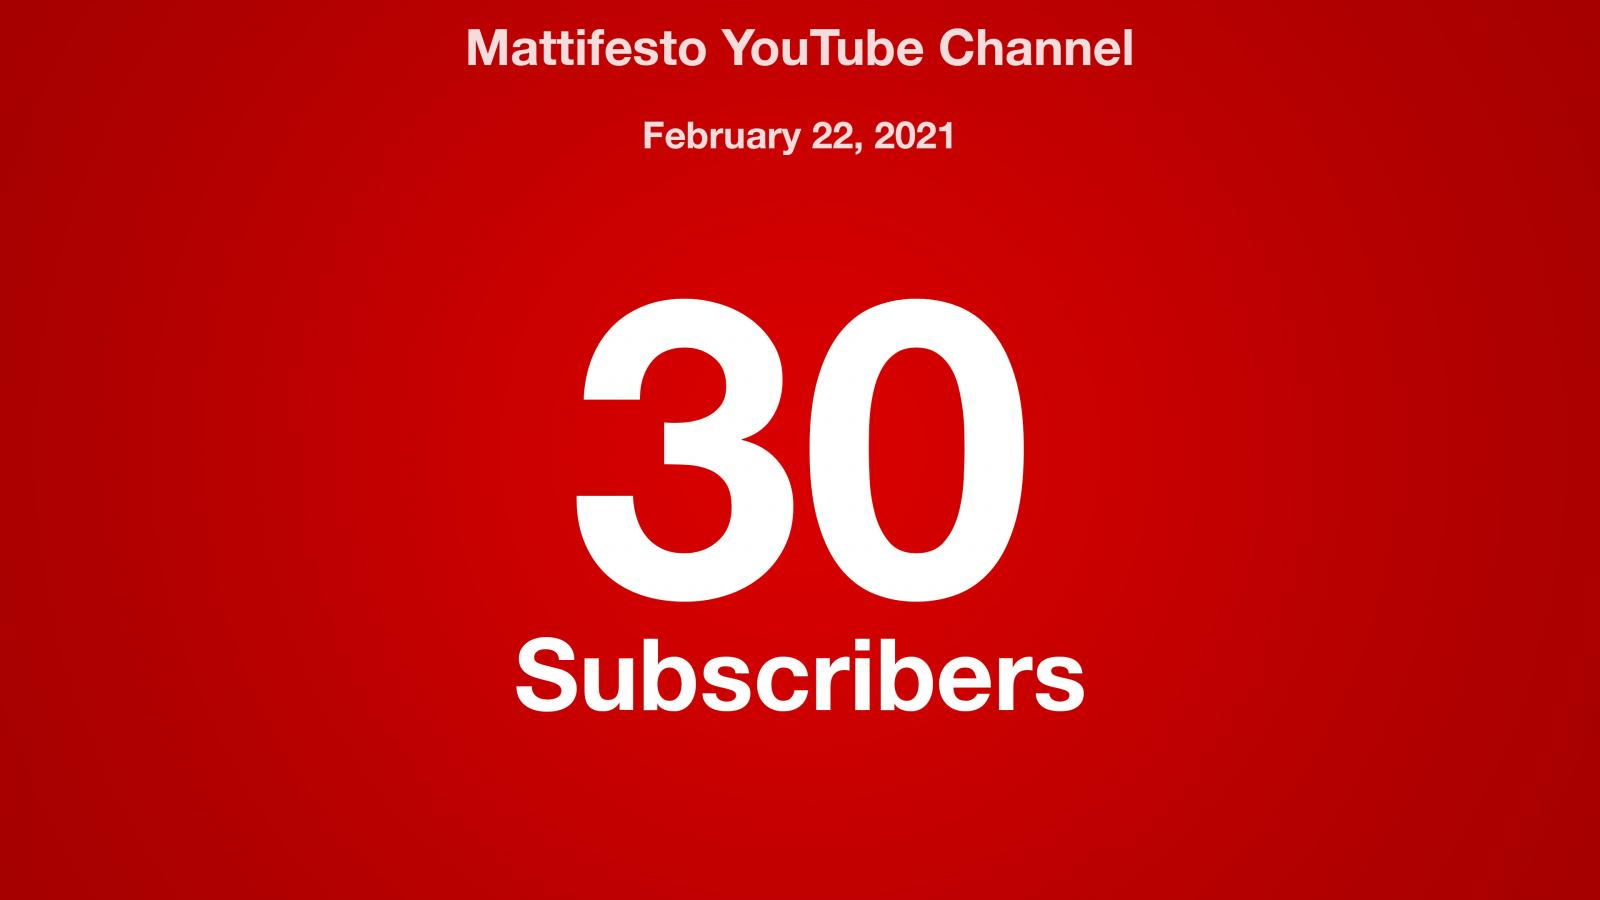 Mattifesto YouTube Channel, February 22, 2021, 30 Subscribers